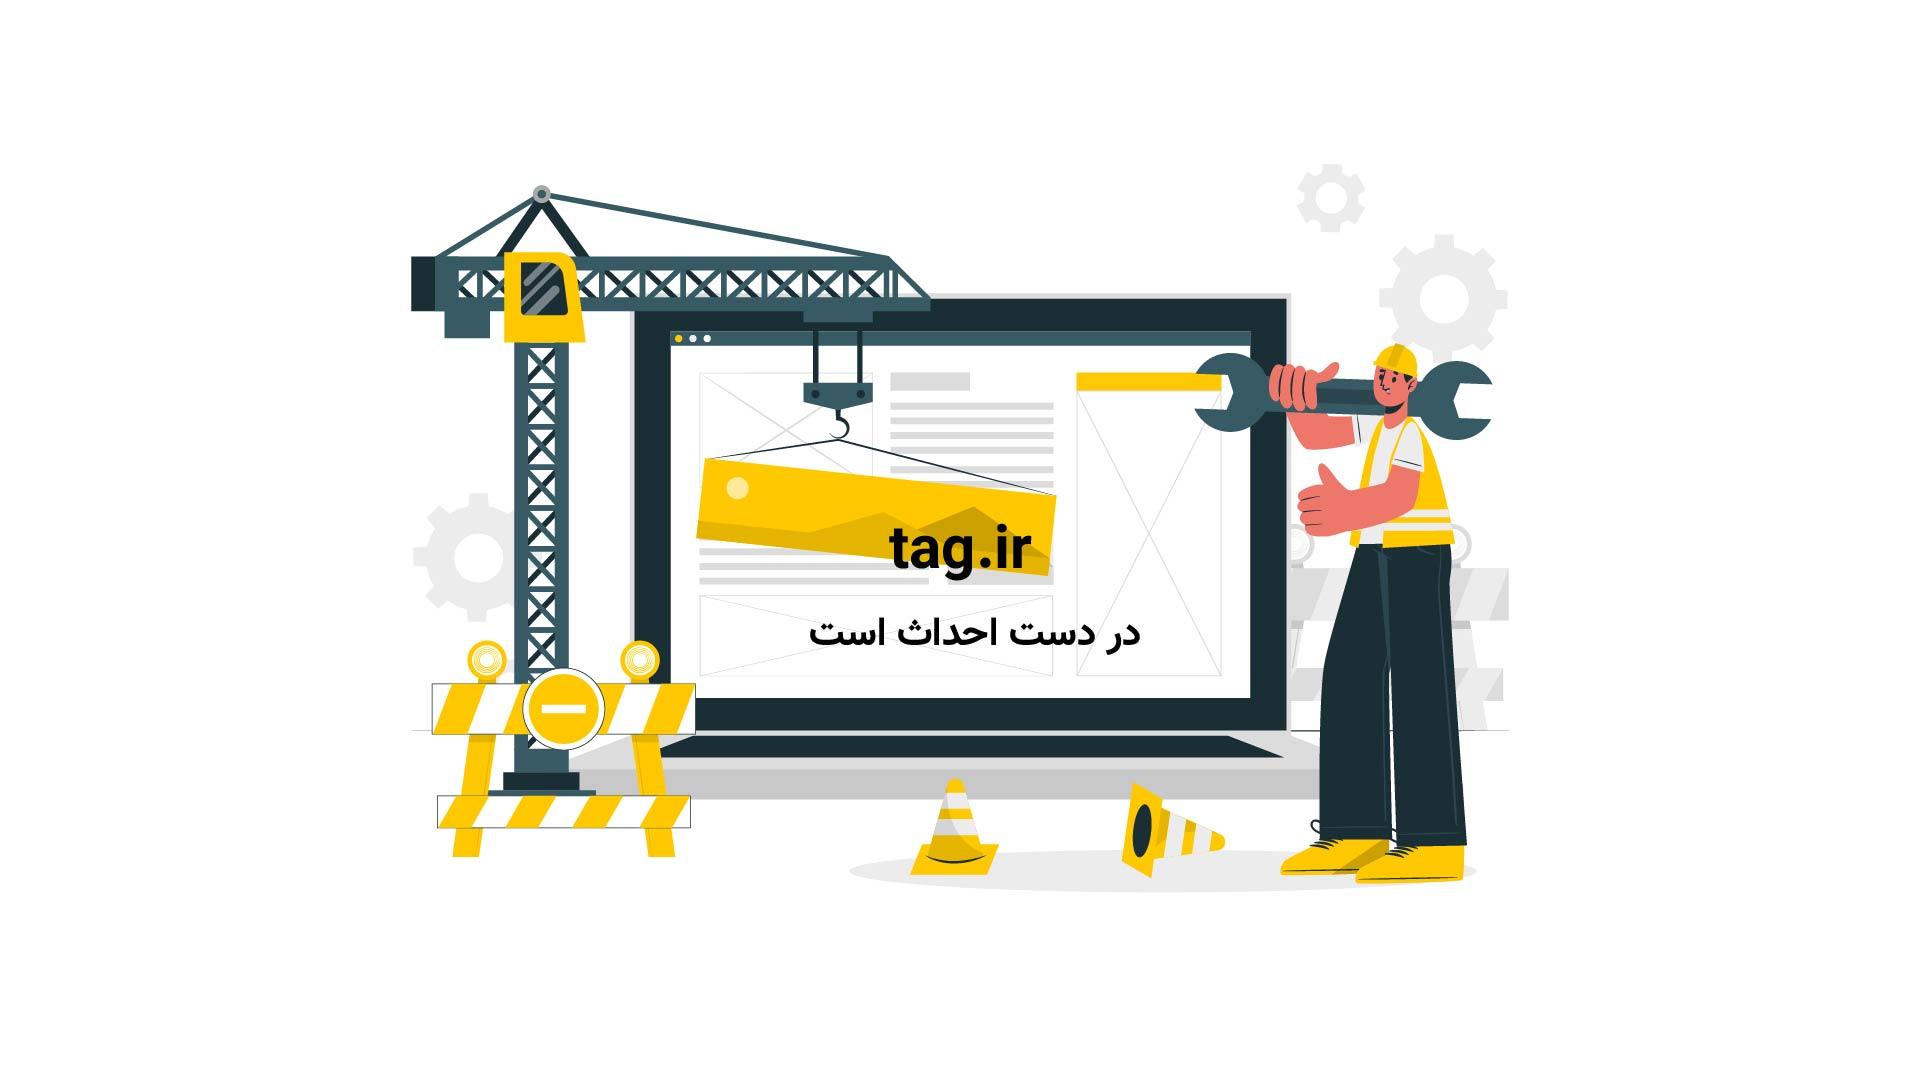 آبشار سلور | تگ